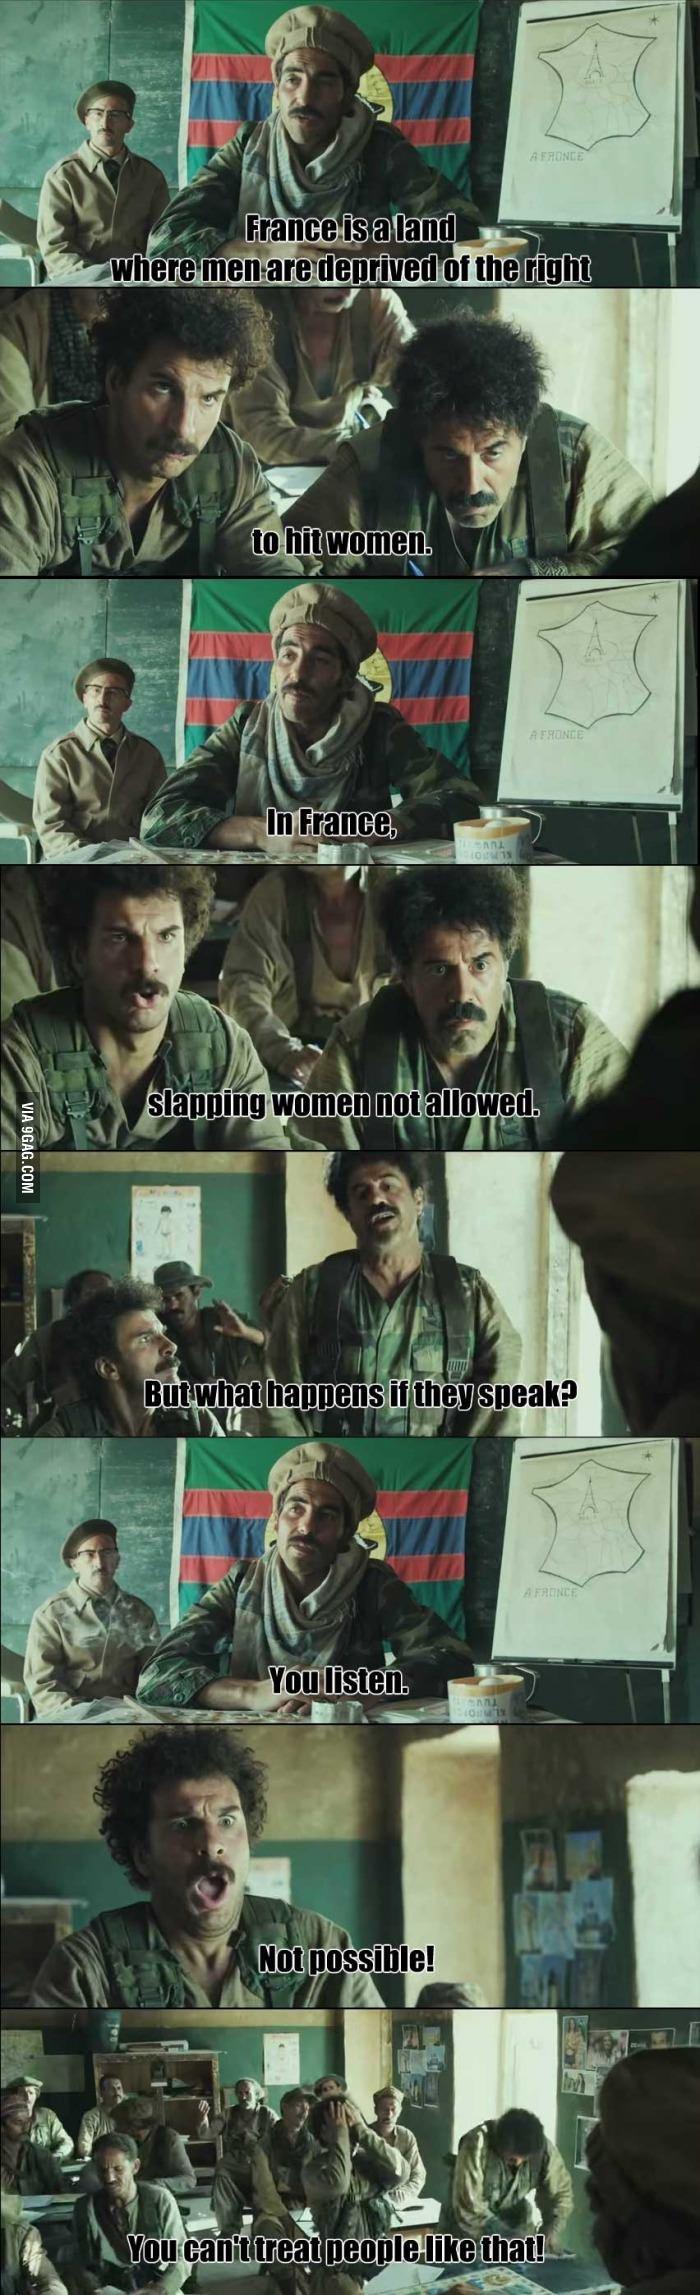 Europe teach refuges. .. Name of the movie is Vive La France